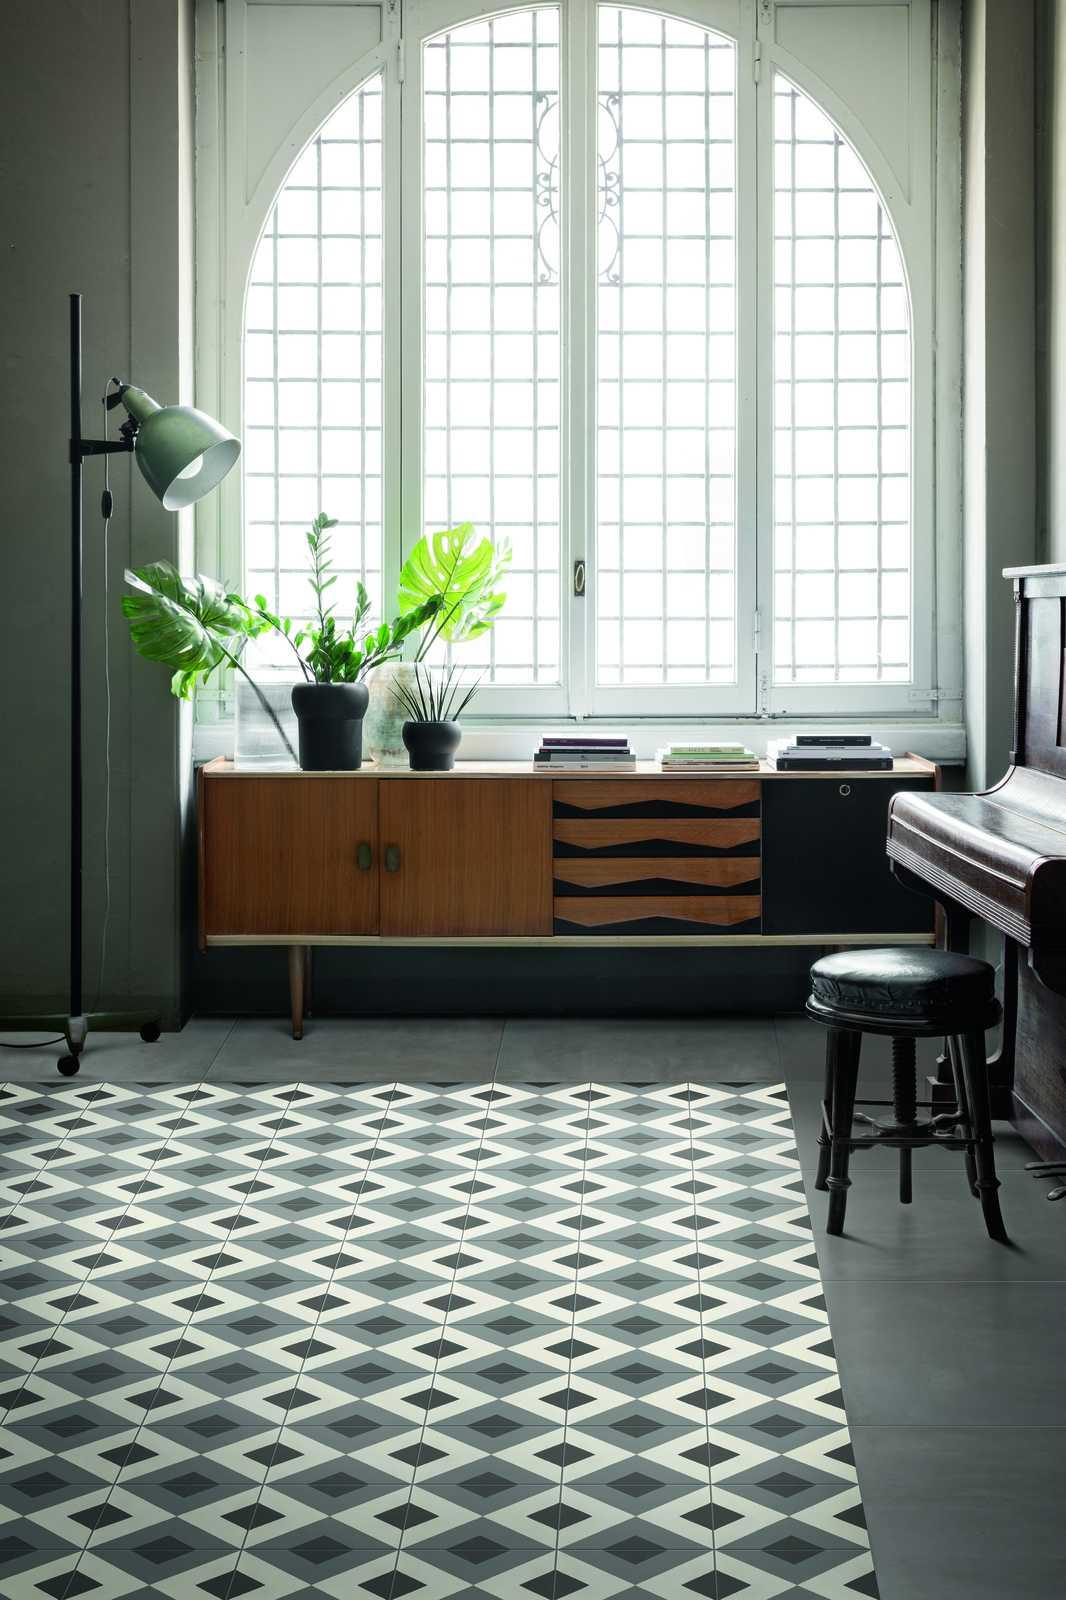 D segni collection stoneware handmade cement tiles marazzi for Handmade cement tiles